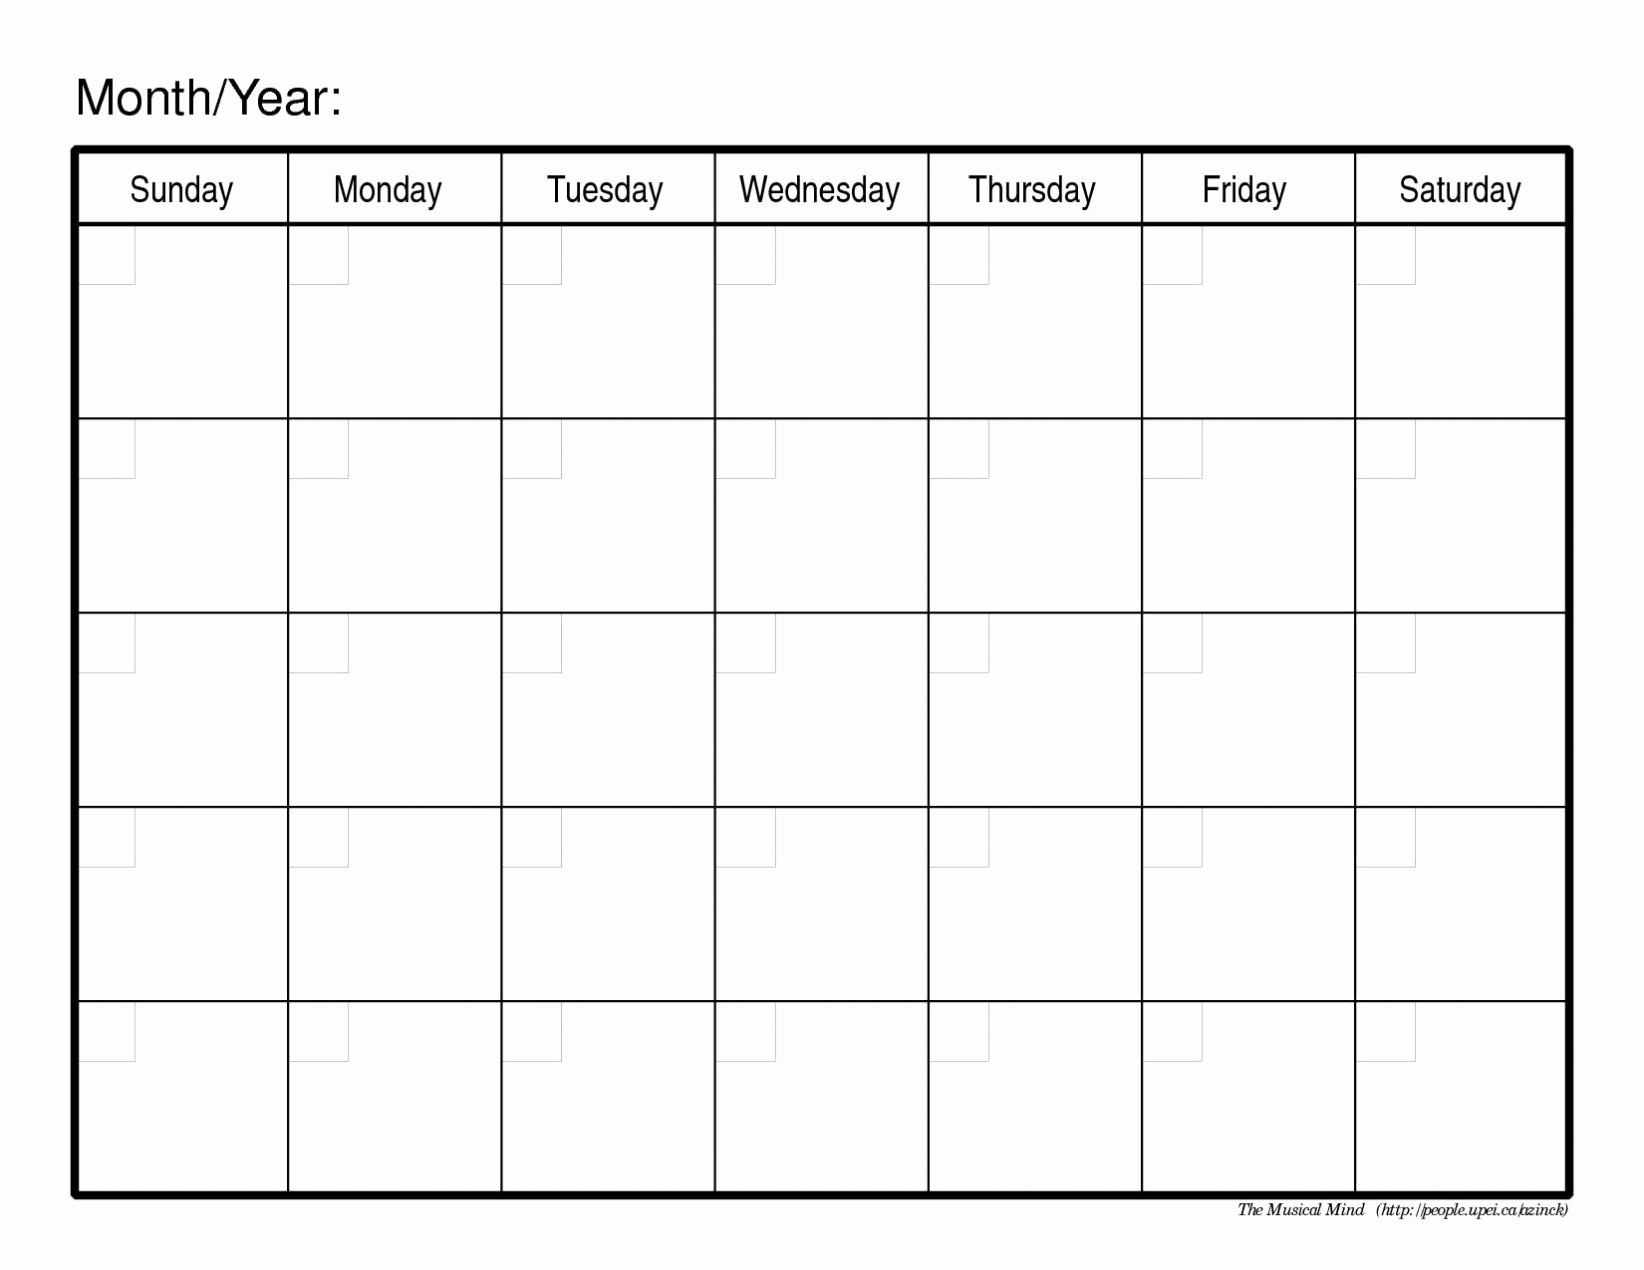 2017 Calendar Month by Month Fresh Printable Monthly Calendar 2017